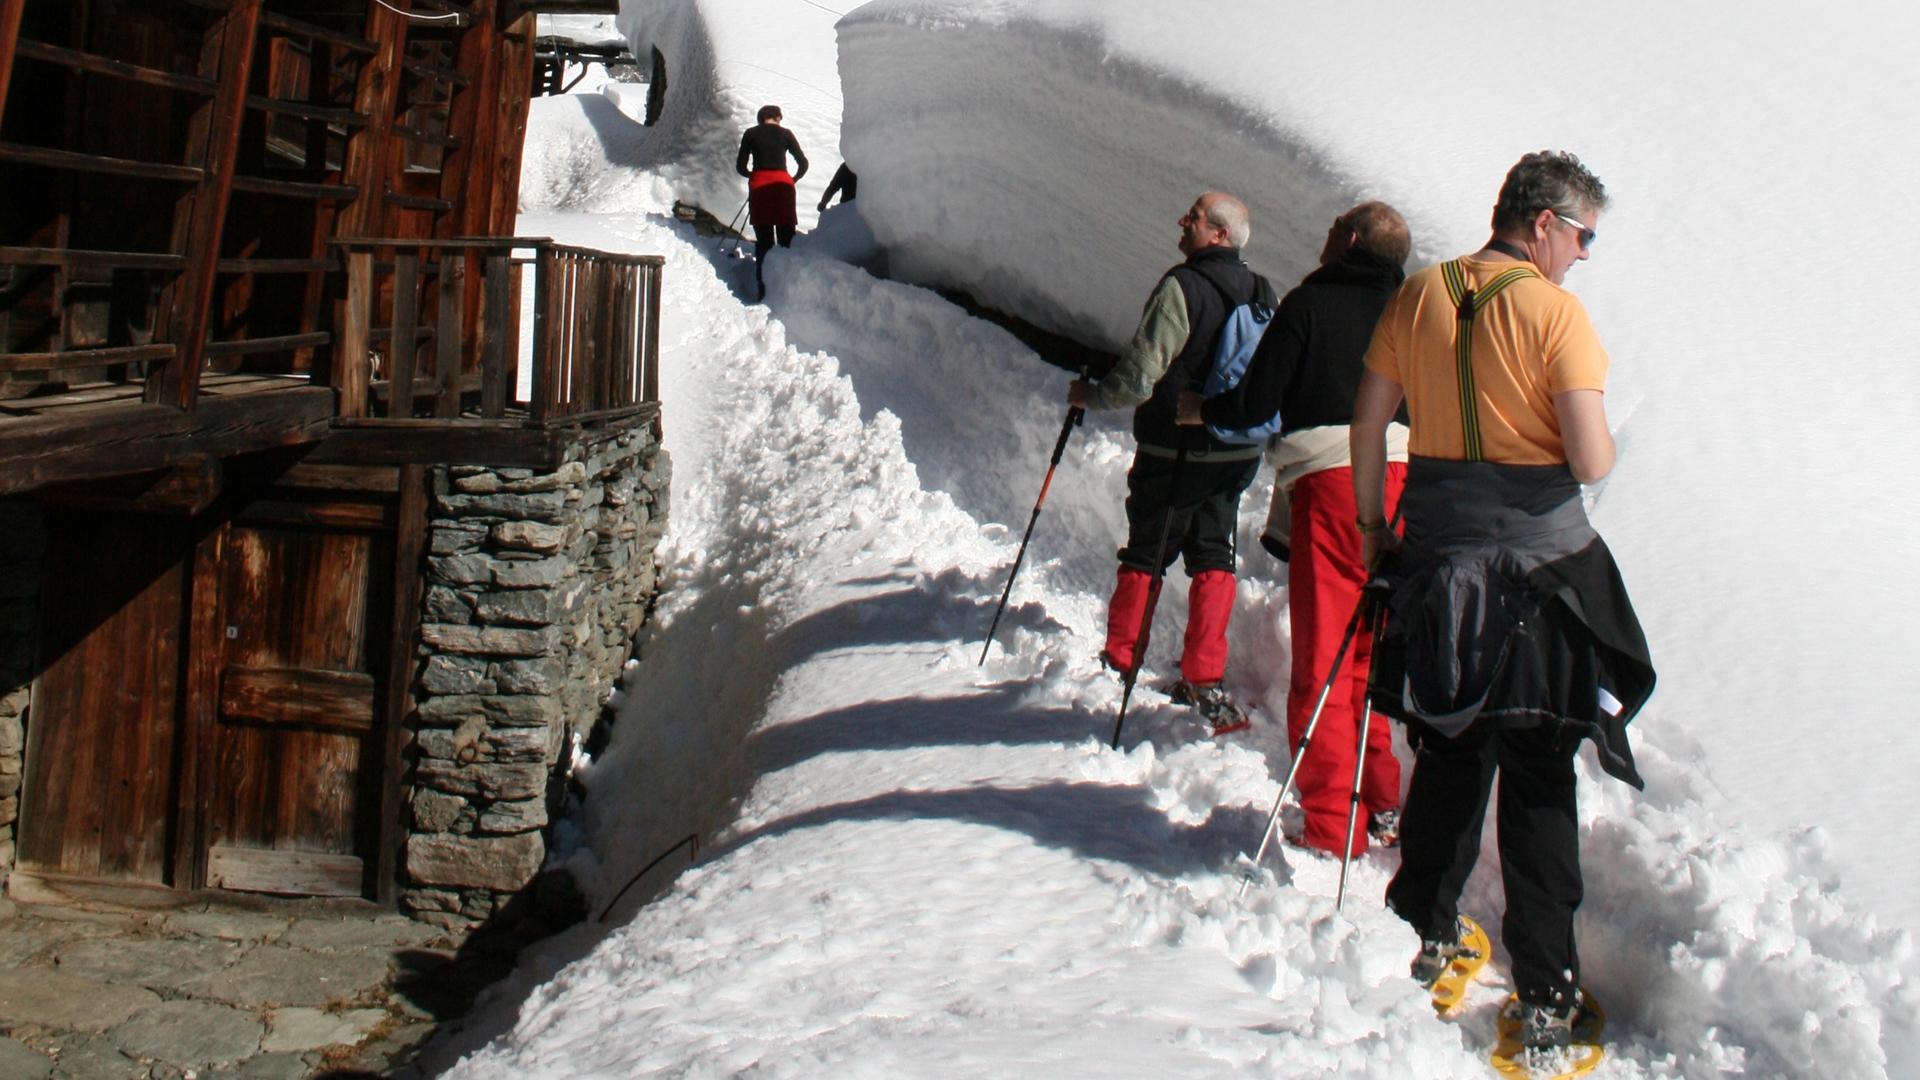 Mountain-planet-ciaspolate-racchette-da-neve-valsesia